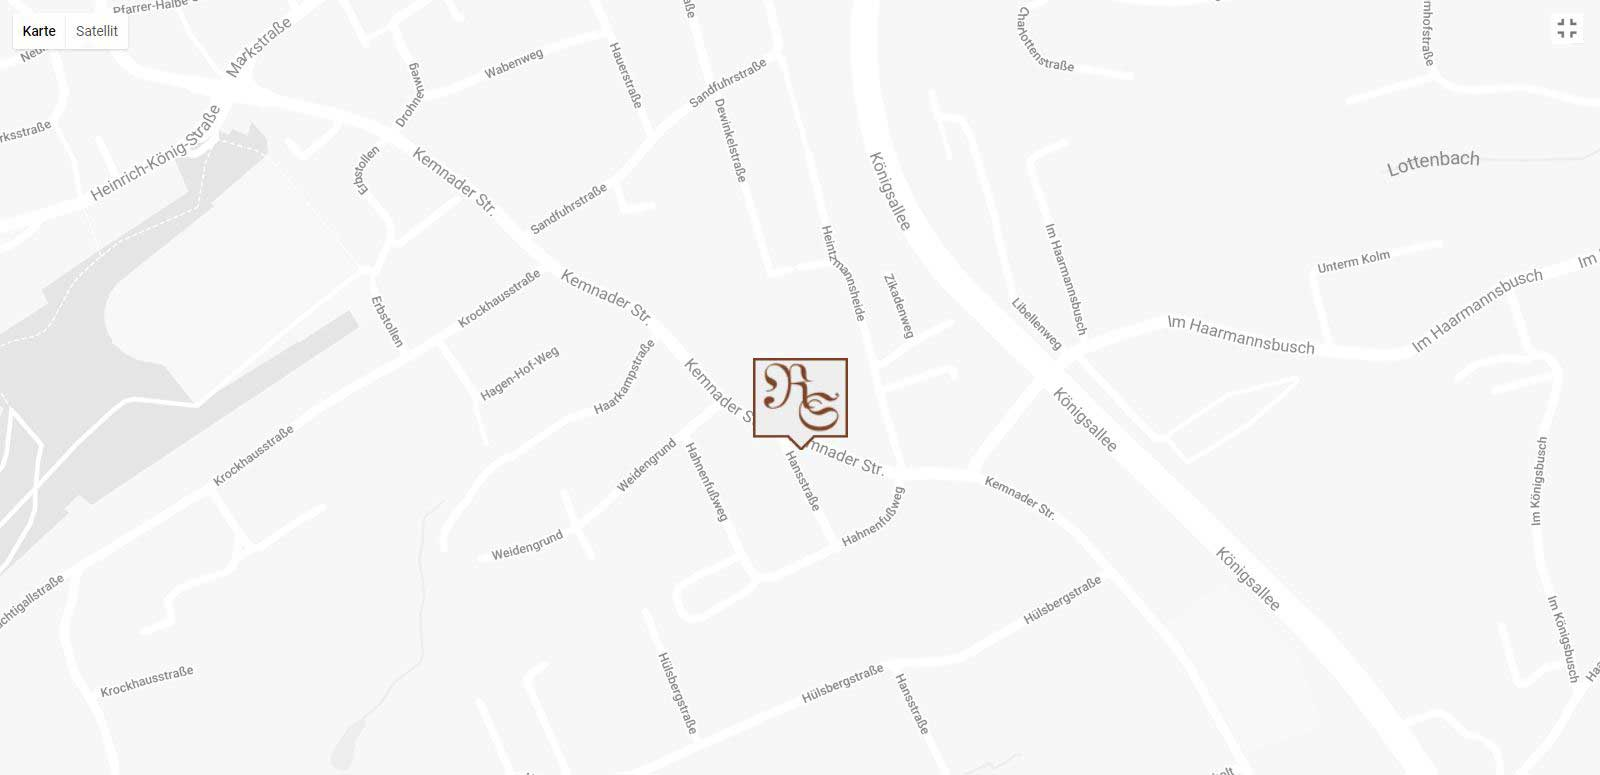 reininghaus Seifert Maps